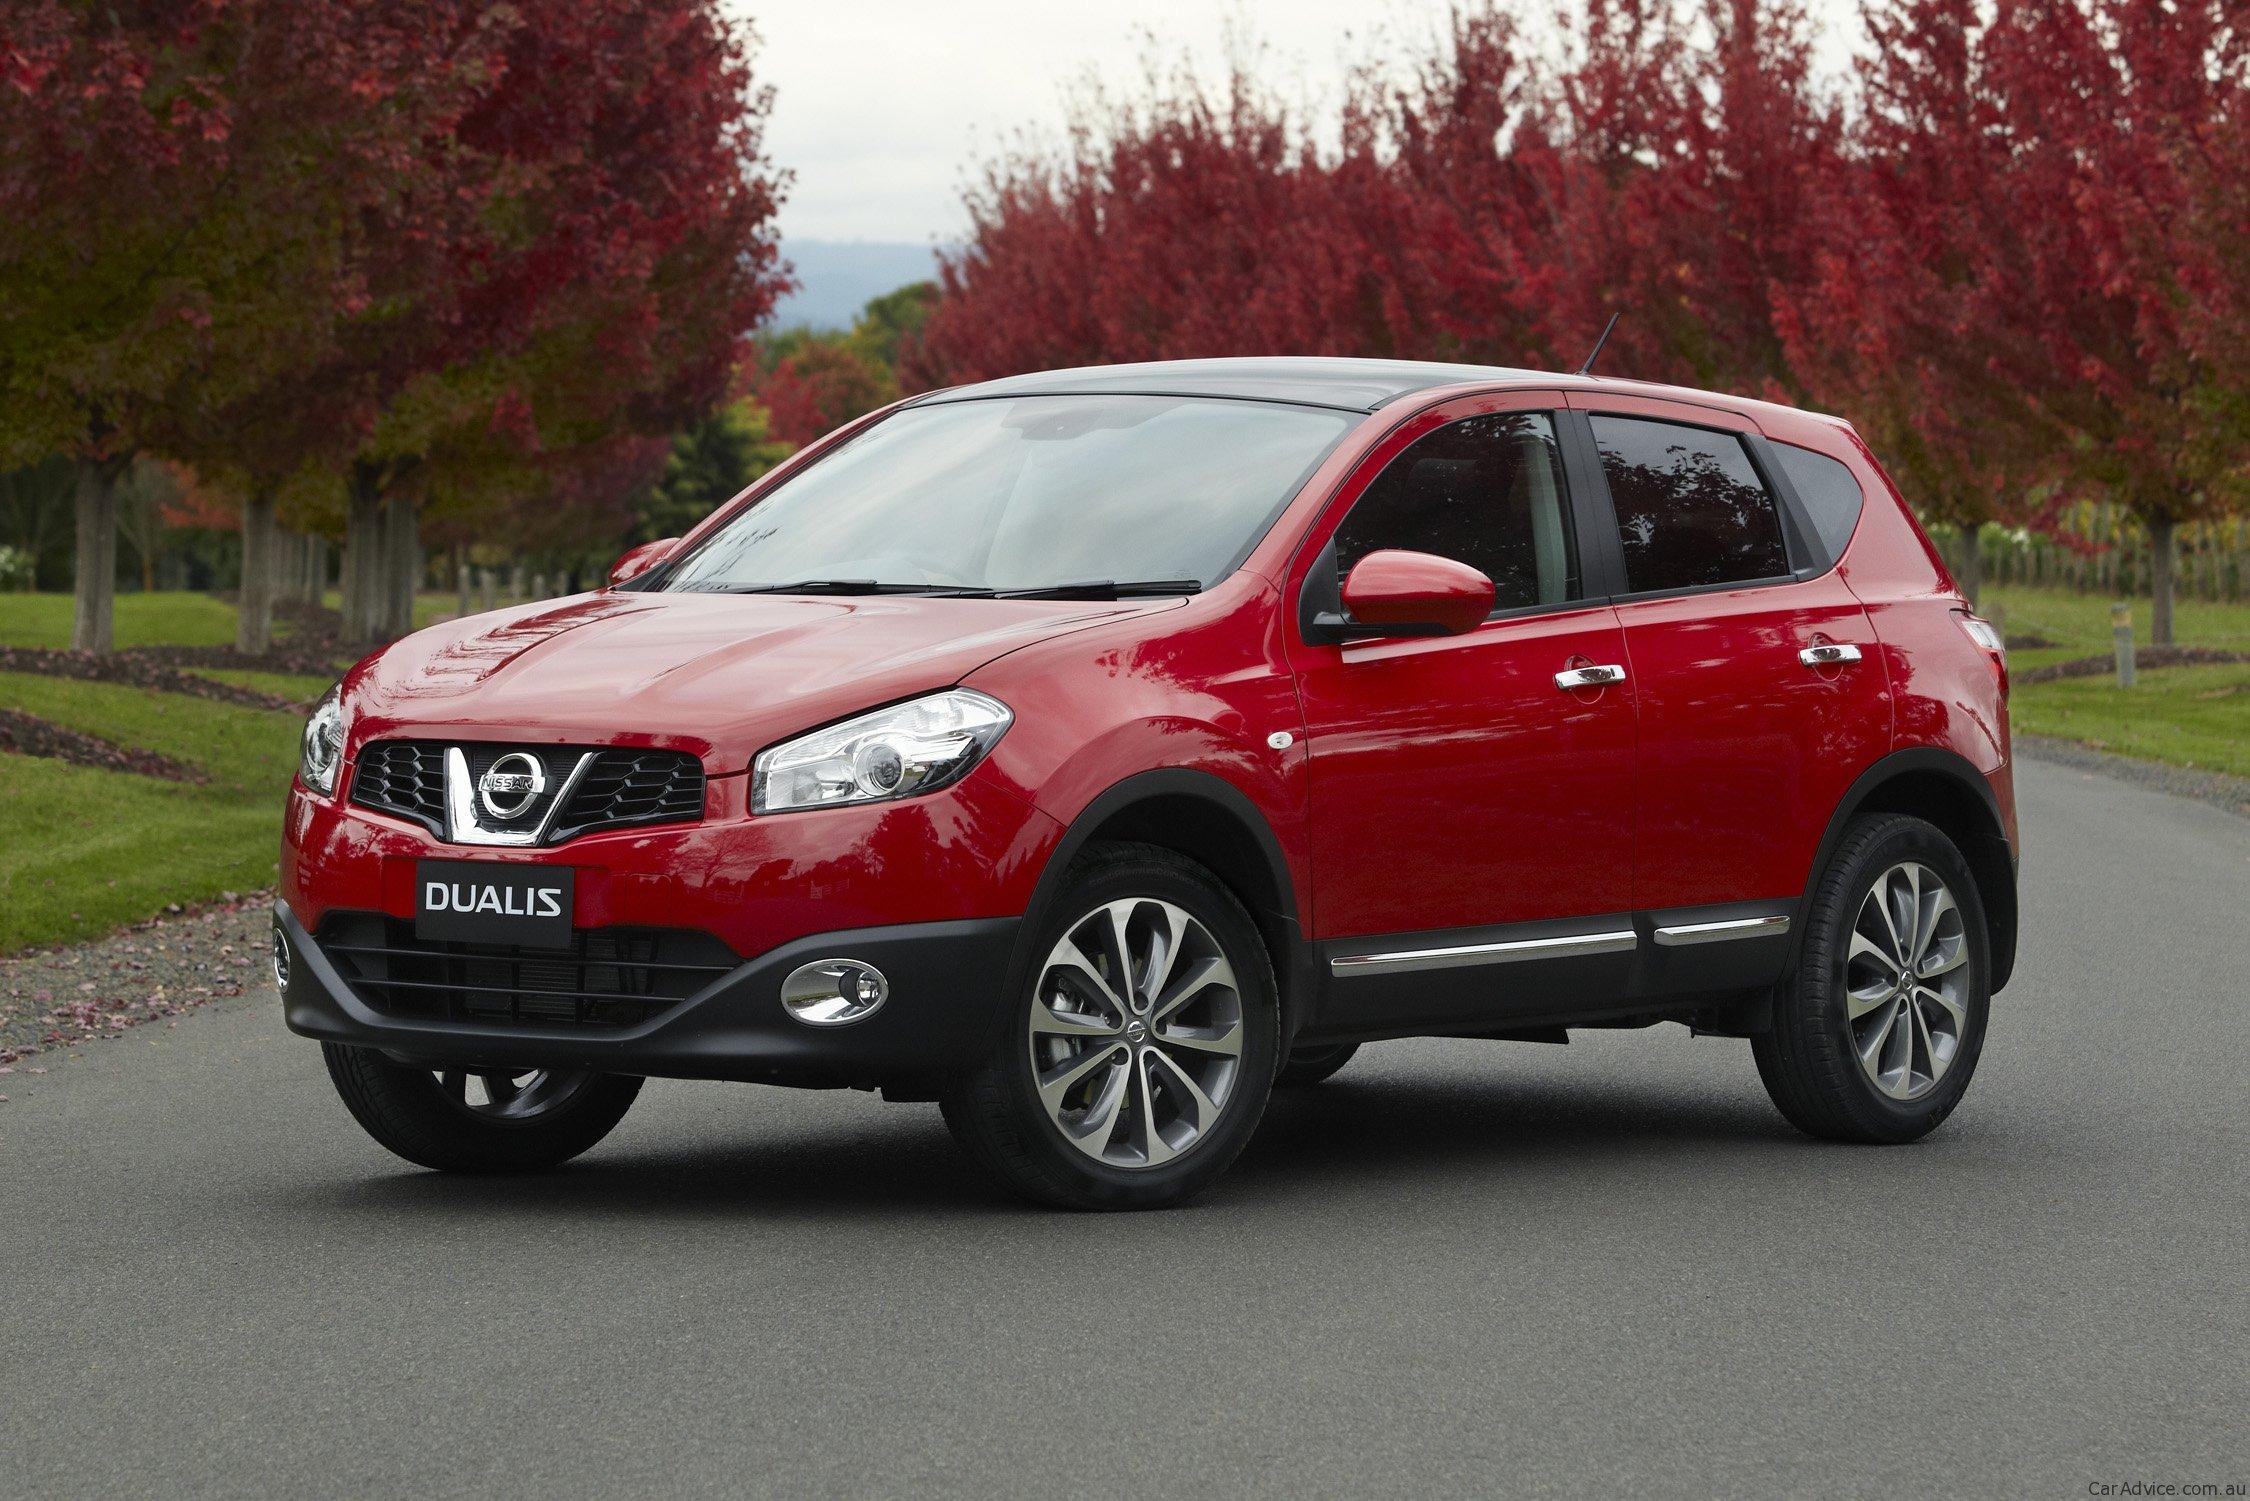 Nissan Dualis Review & Nissan Dualis+2 Review